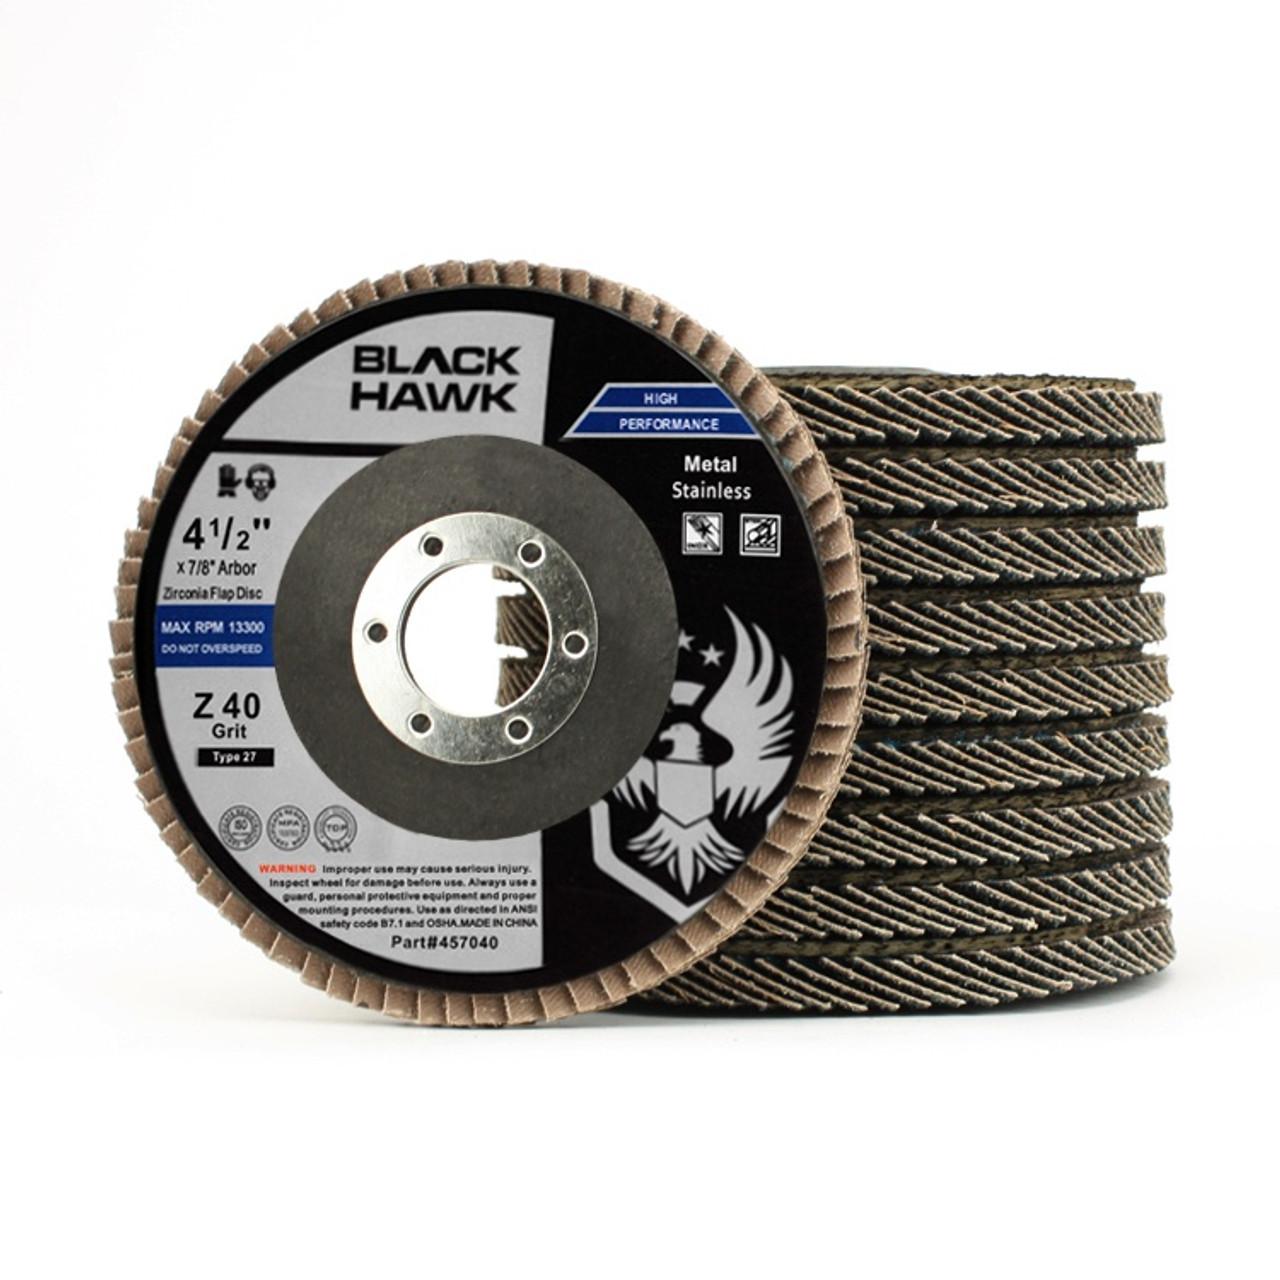 "10 Pack 4.5/"" x 7//8/"" Black Hawk 40 Grit Zirconia Flap Disc Grinding Wheels T27"